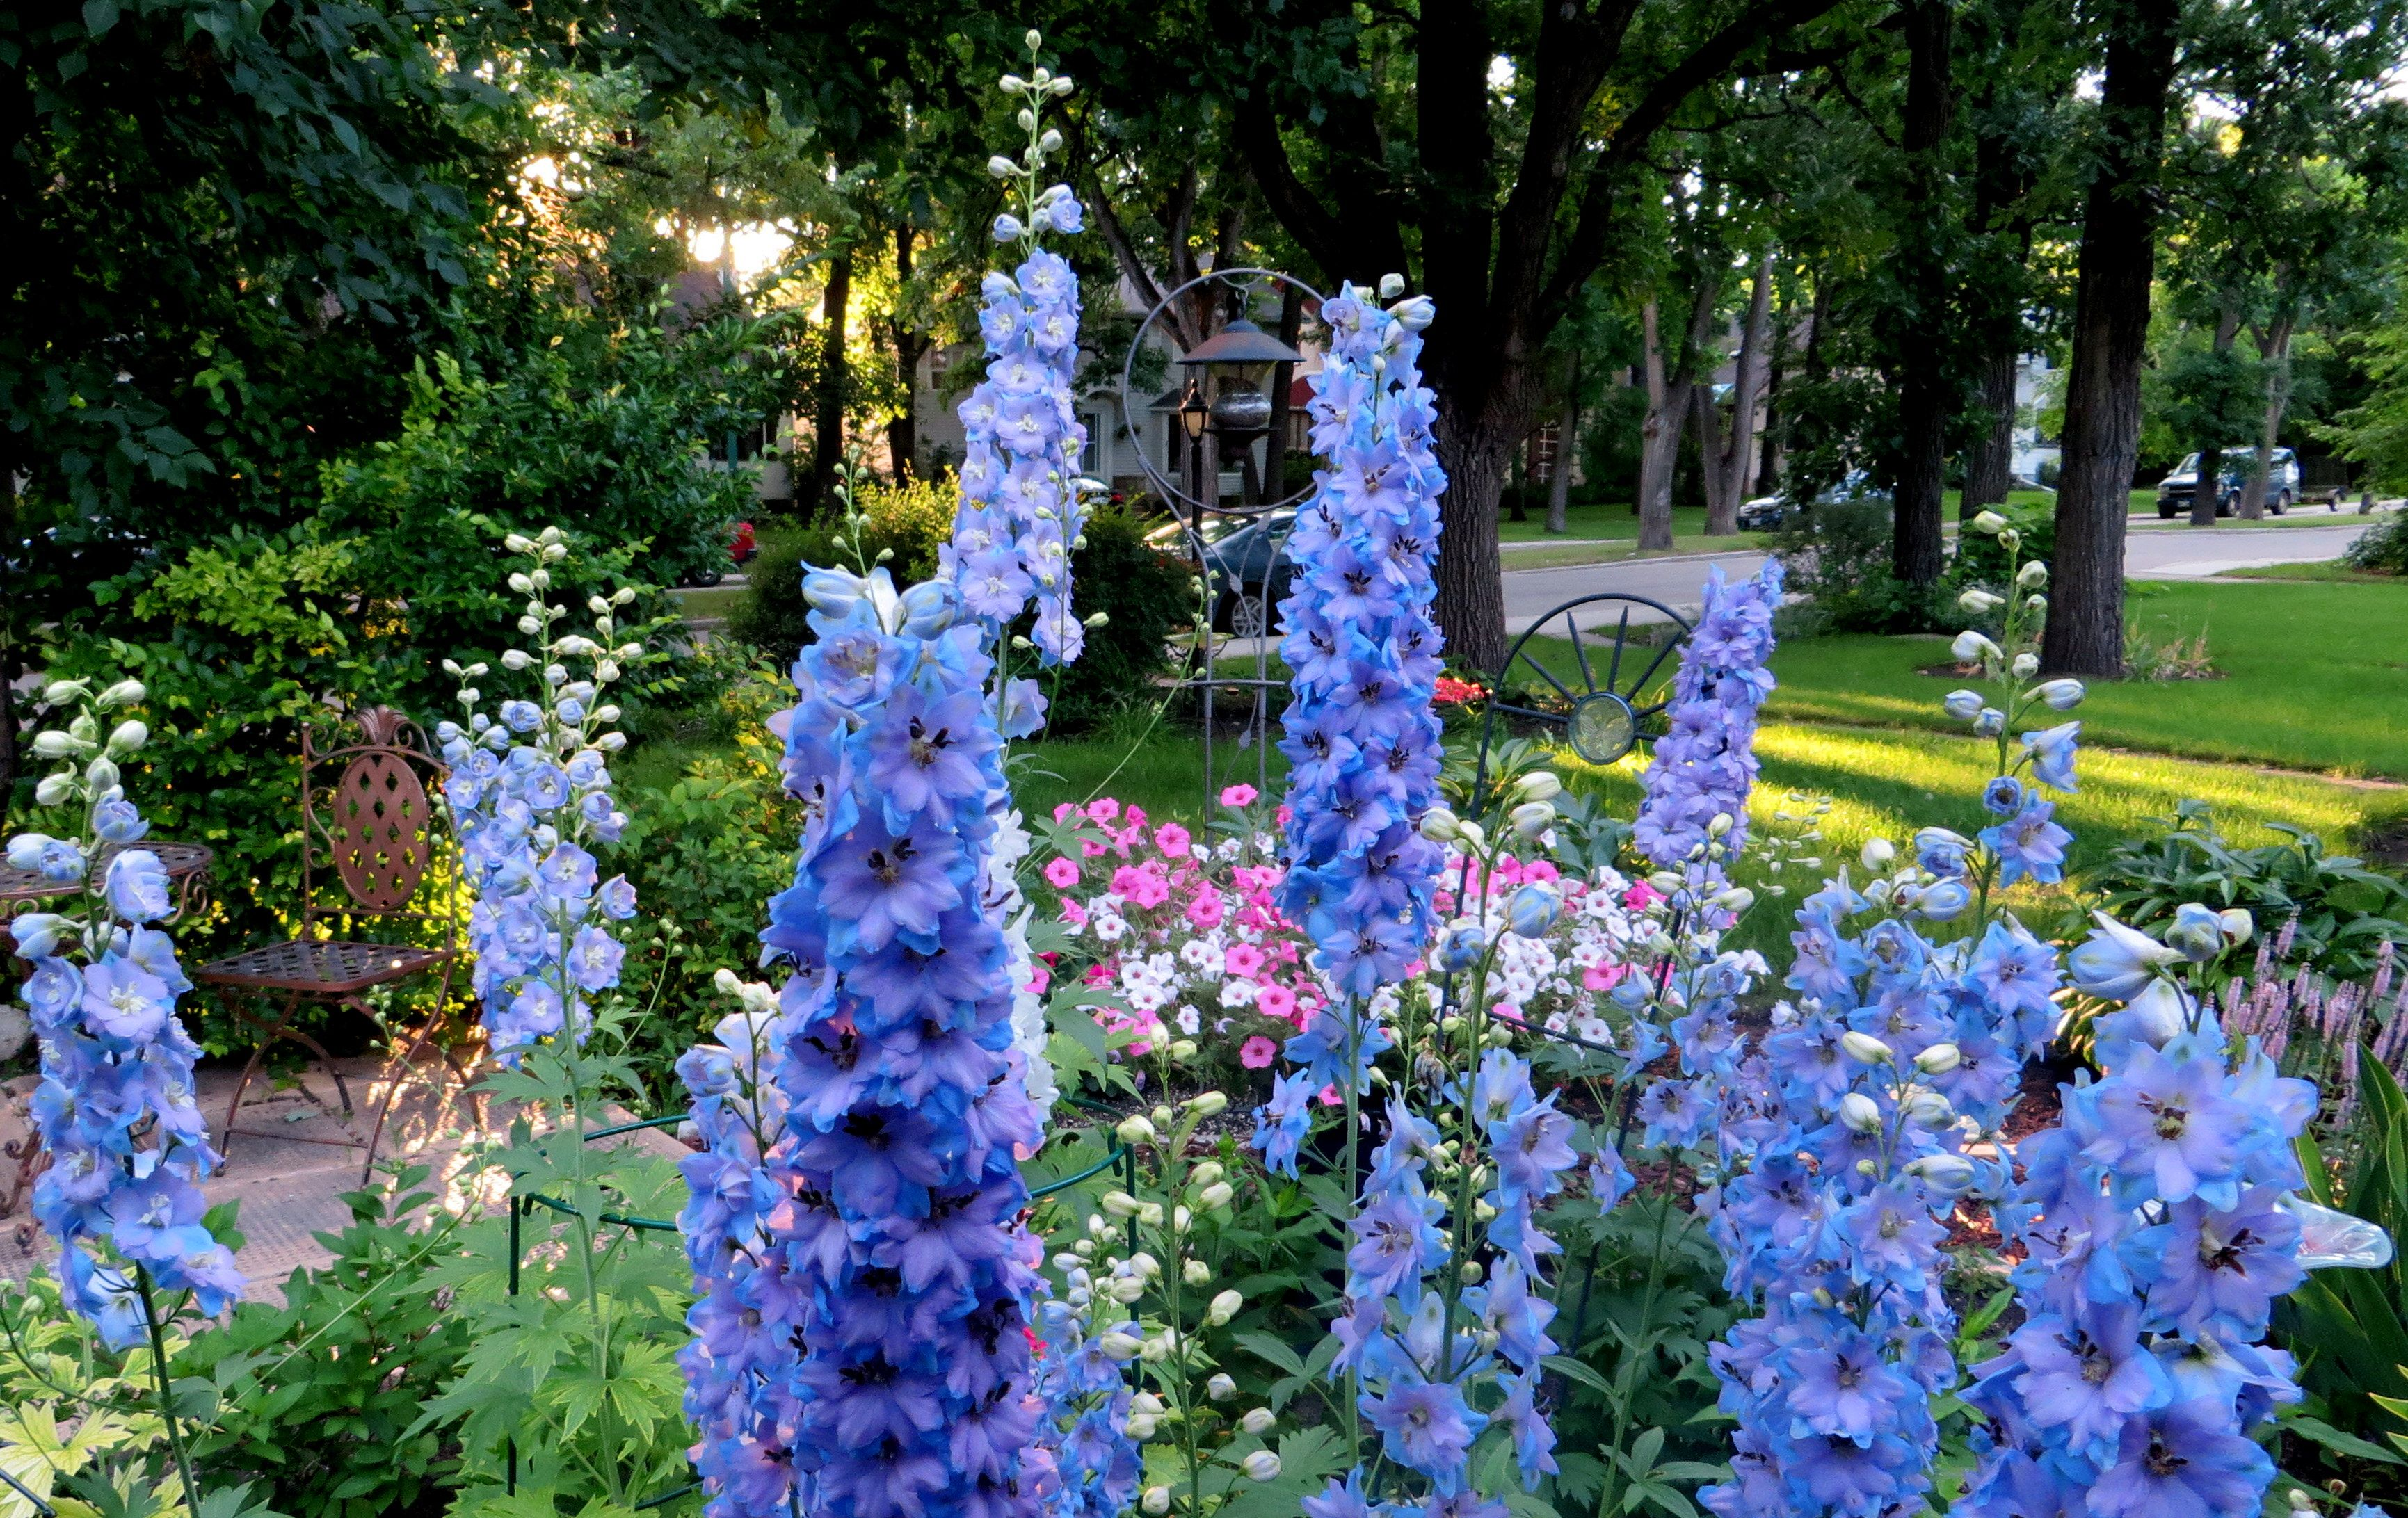 Cottage Garden Delphinium Perennial And Annual Plants Delphinium Deer Resistant Perennials Perennials